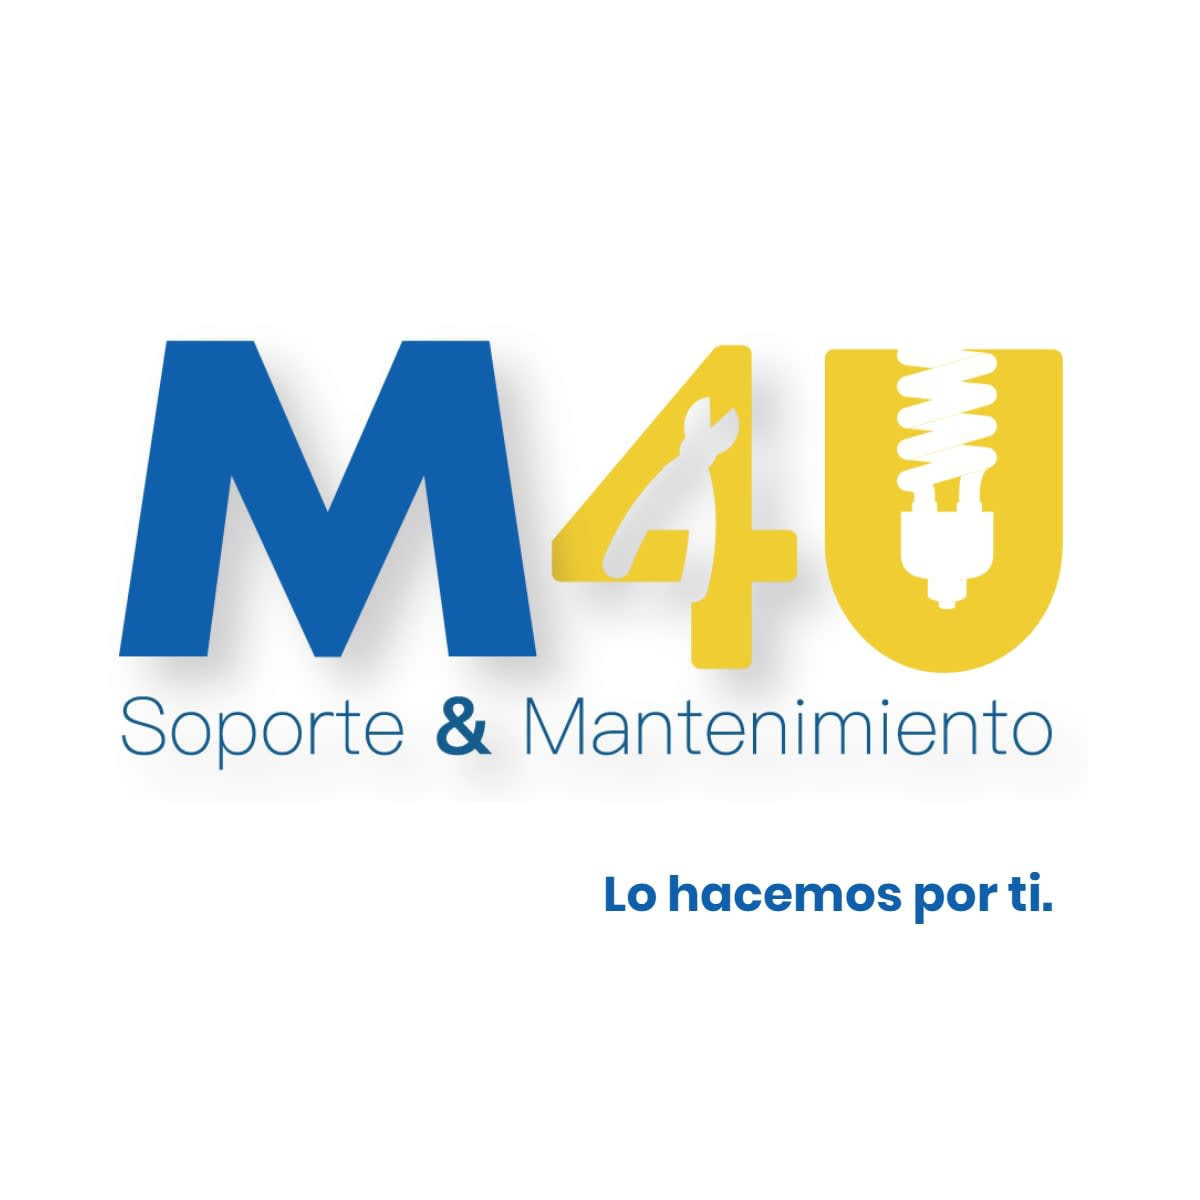 Made4U Soporte & Mantenimieto